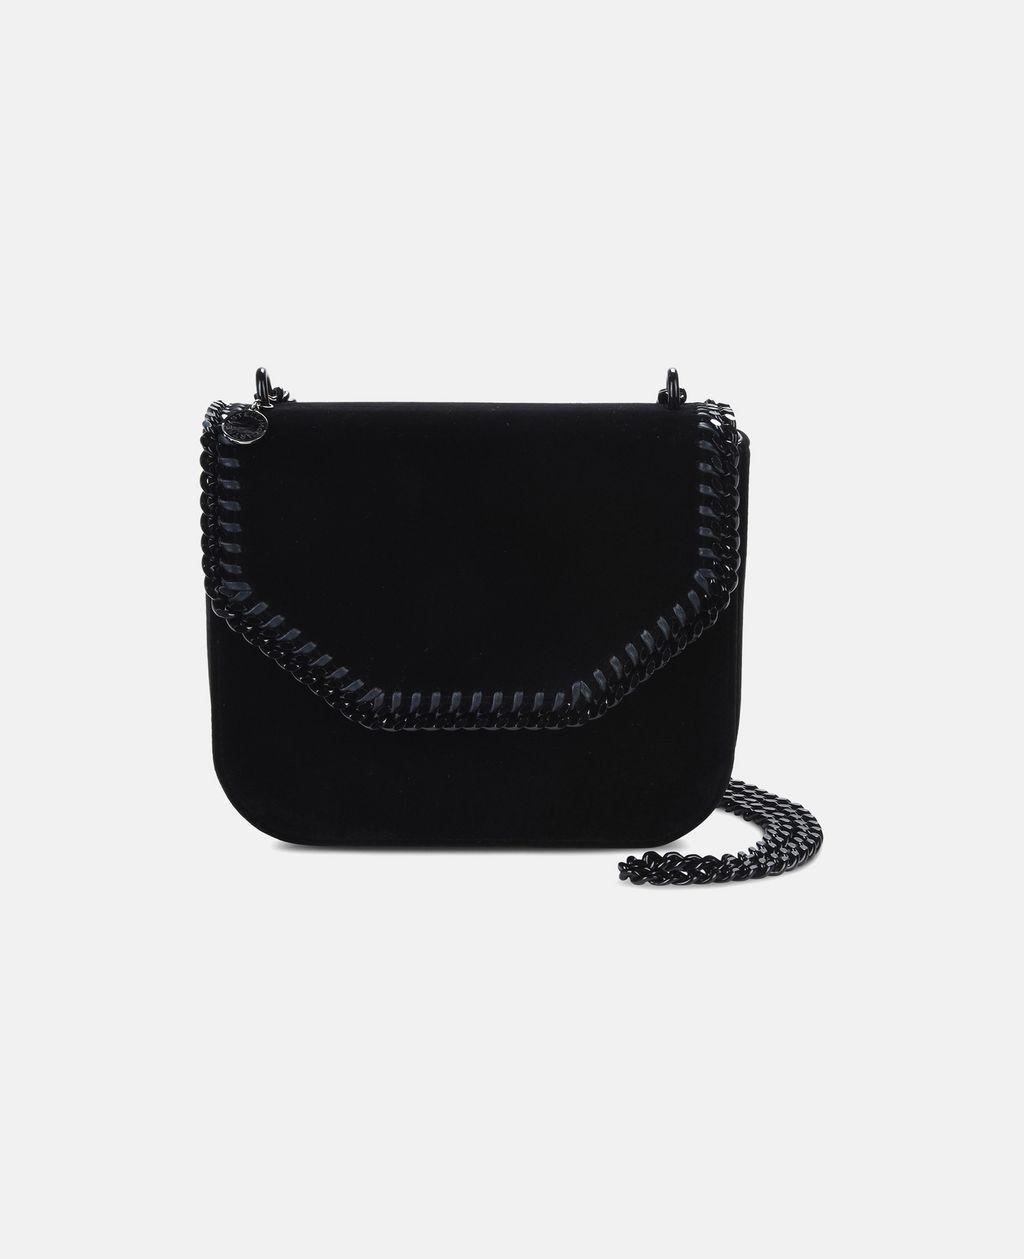 Velvet Black Falabella Box Large Shoulder Bag - STELLA MCCARTNEY  b5d6b36485d15